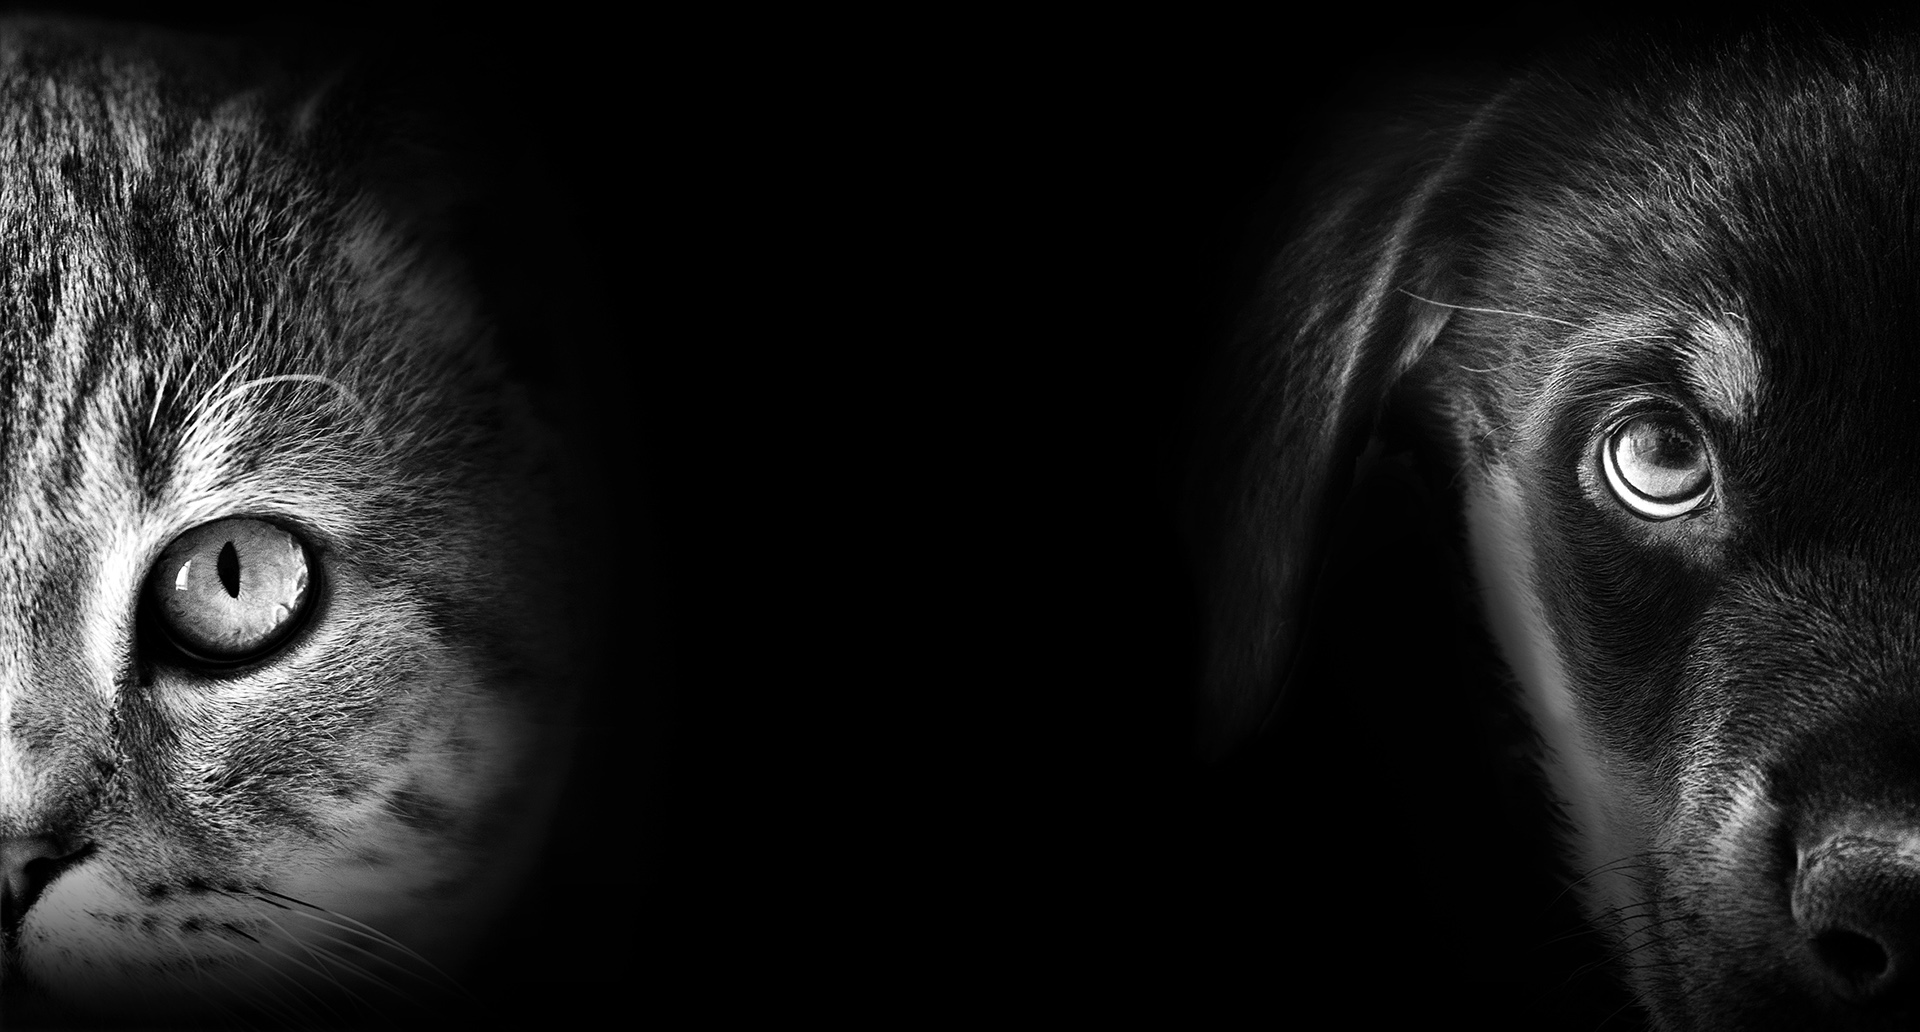 cat and dog portrait in dark